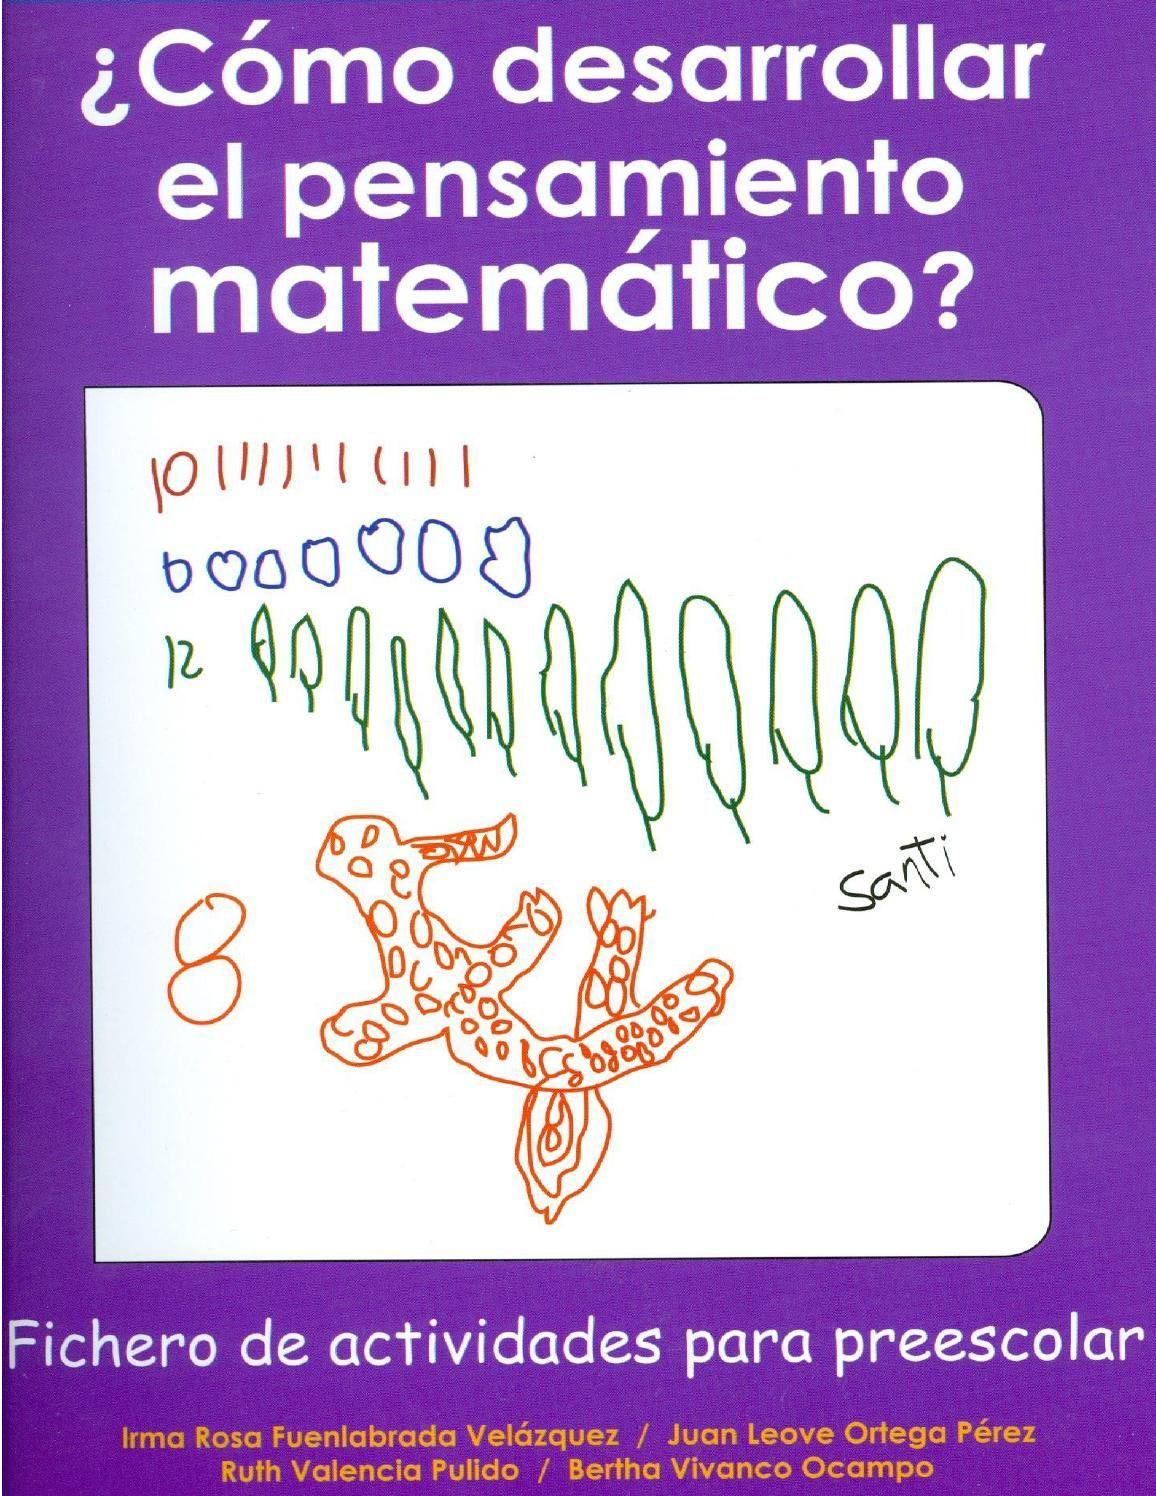 Fichero irma fuenlabrada pensamiento matematico